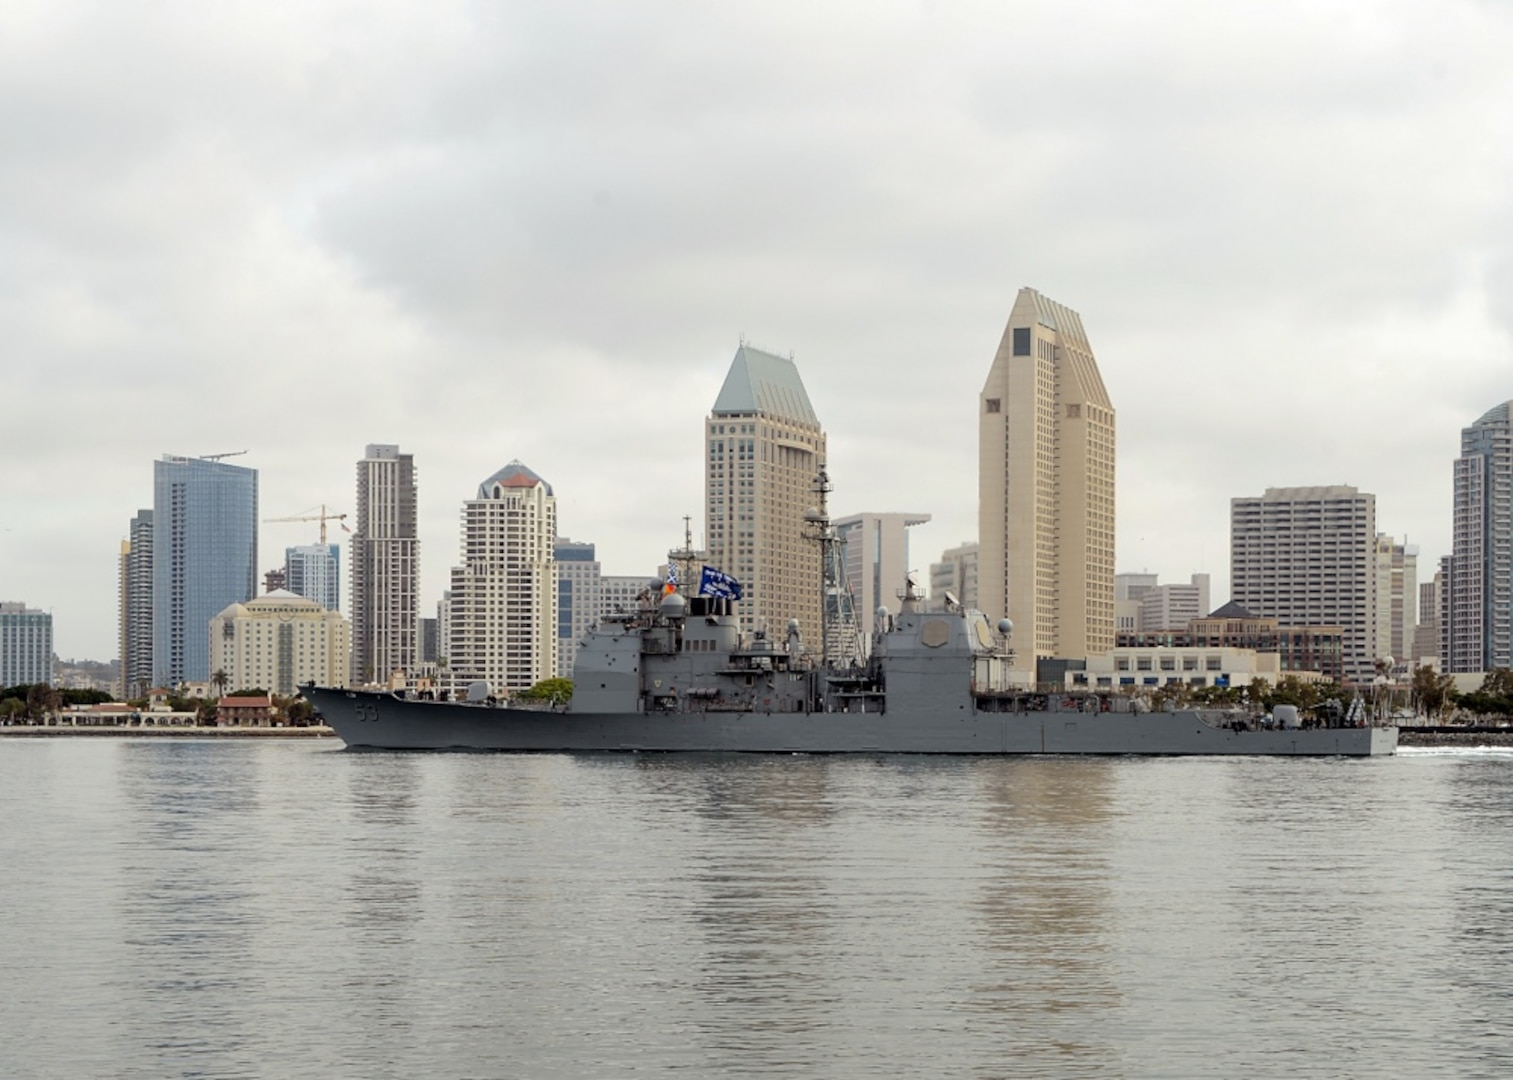 John C. Stennis Carrier Strike Group Cruiser-Destroyer Warships Underway for Surface Warfare Advanced Tactical Training